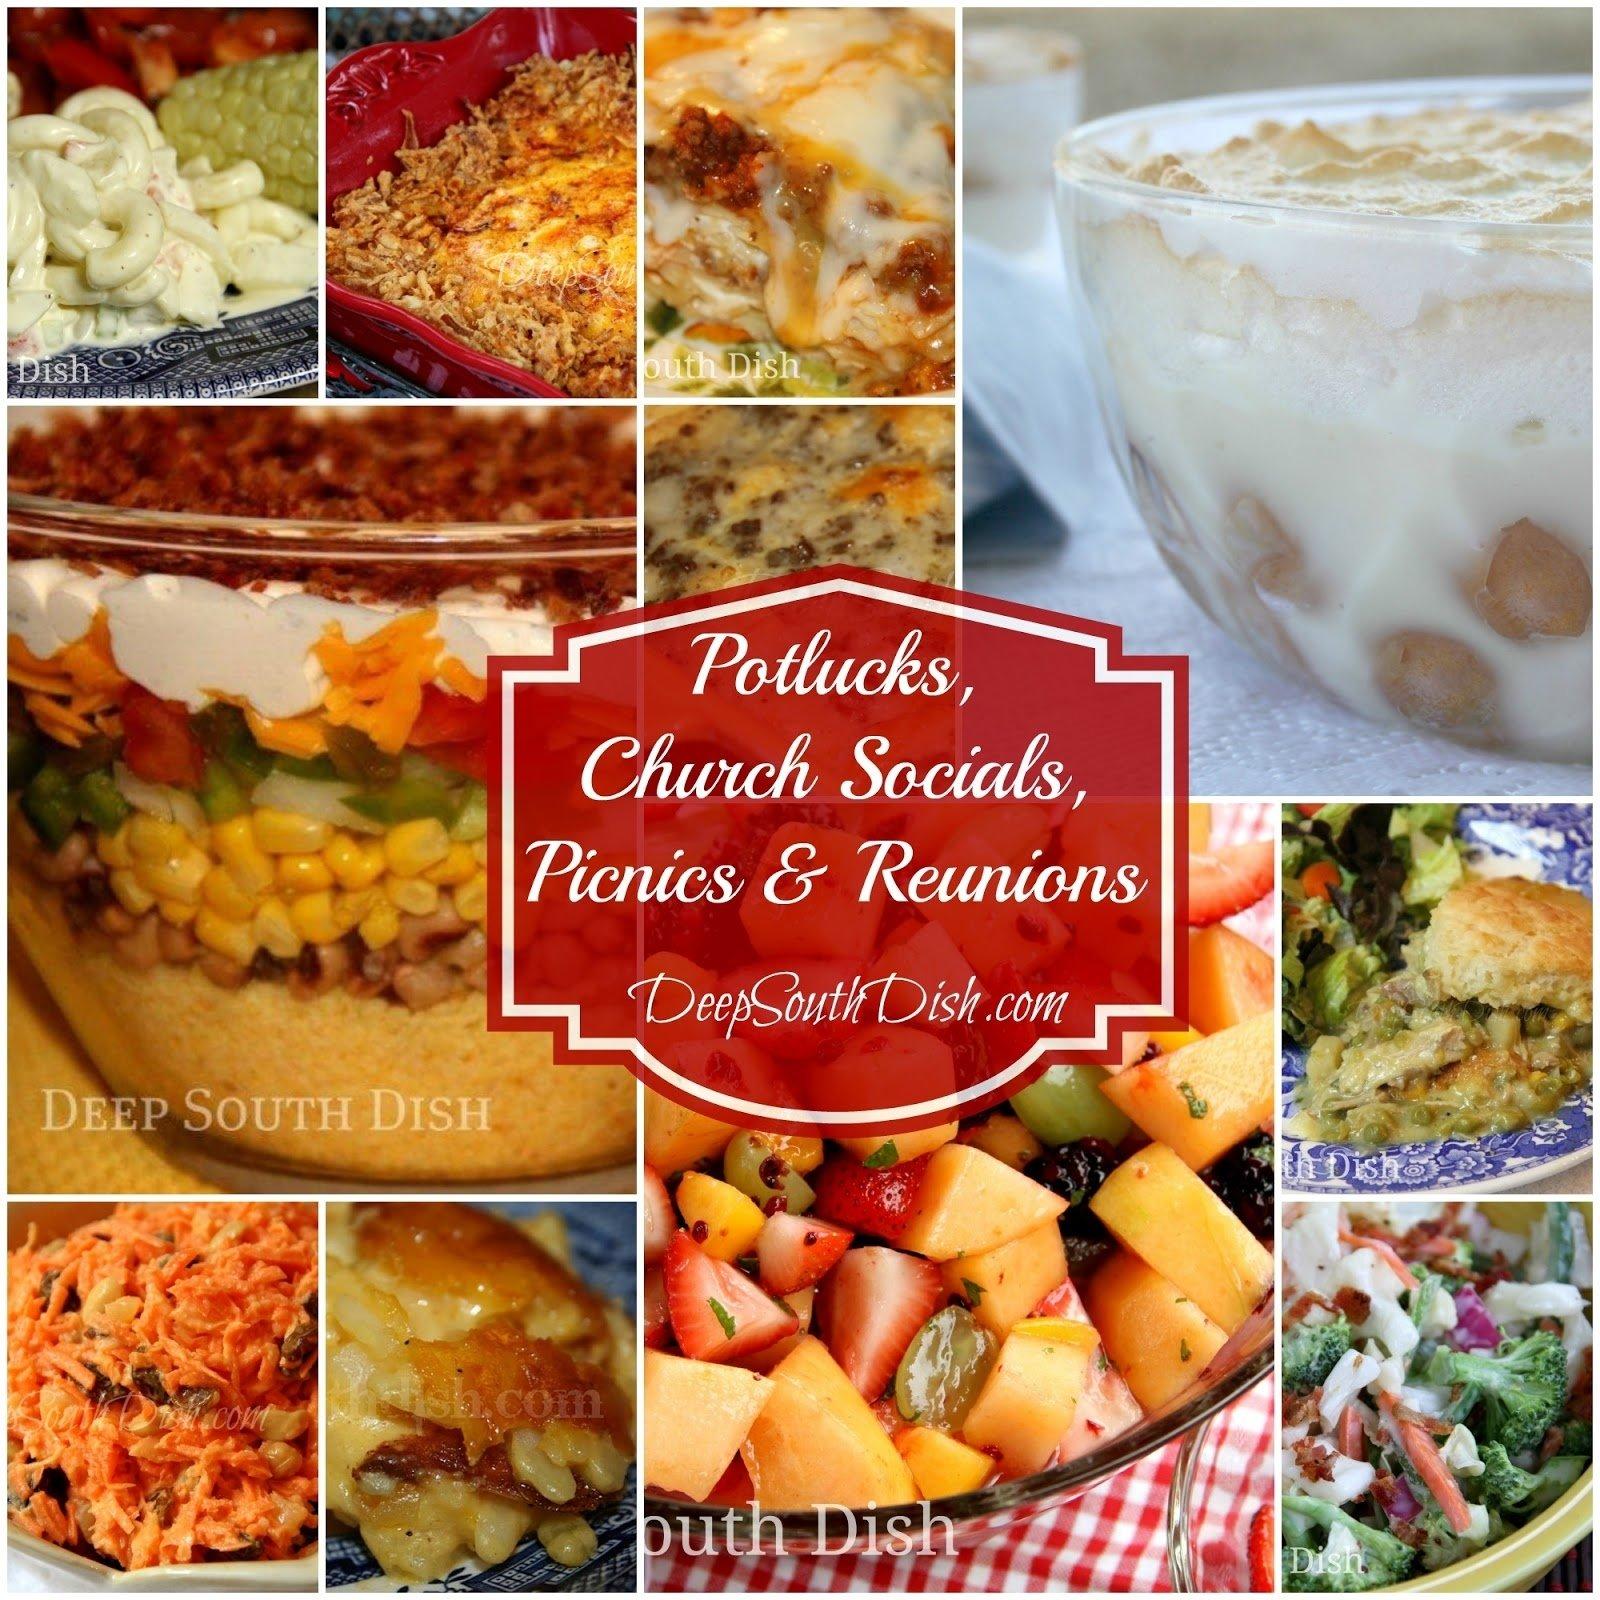 10 Pretty Breakfast Ideas For Work Party deep south dish recipes for potlucks church socials picnics 8